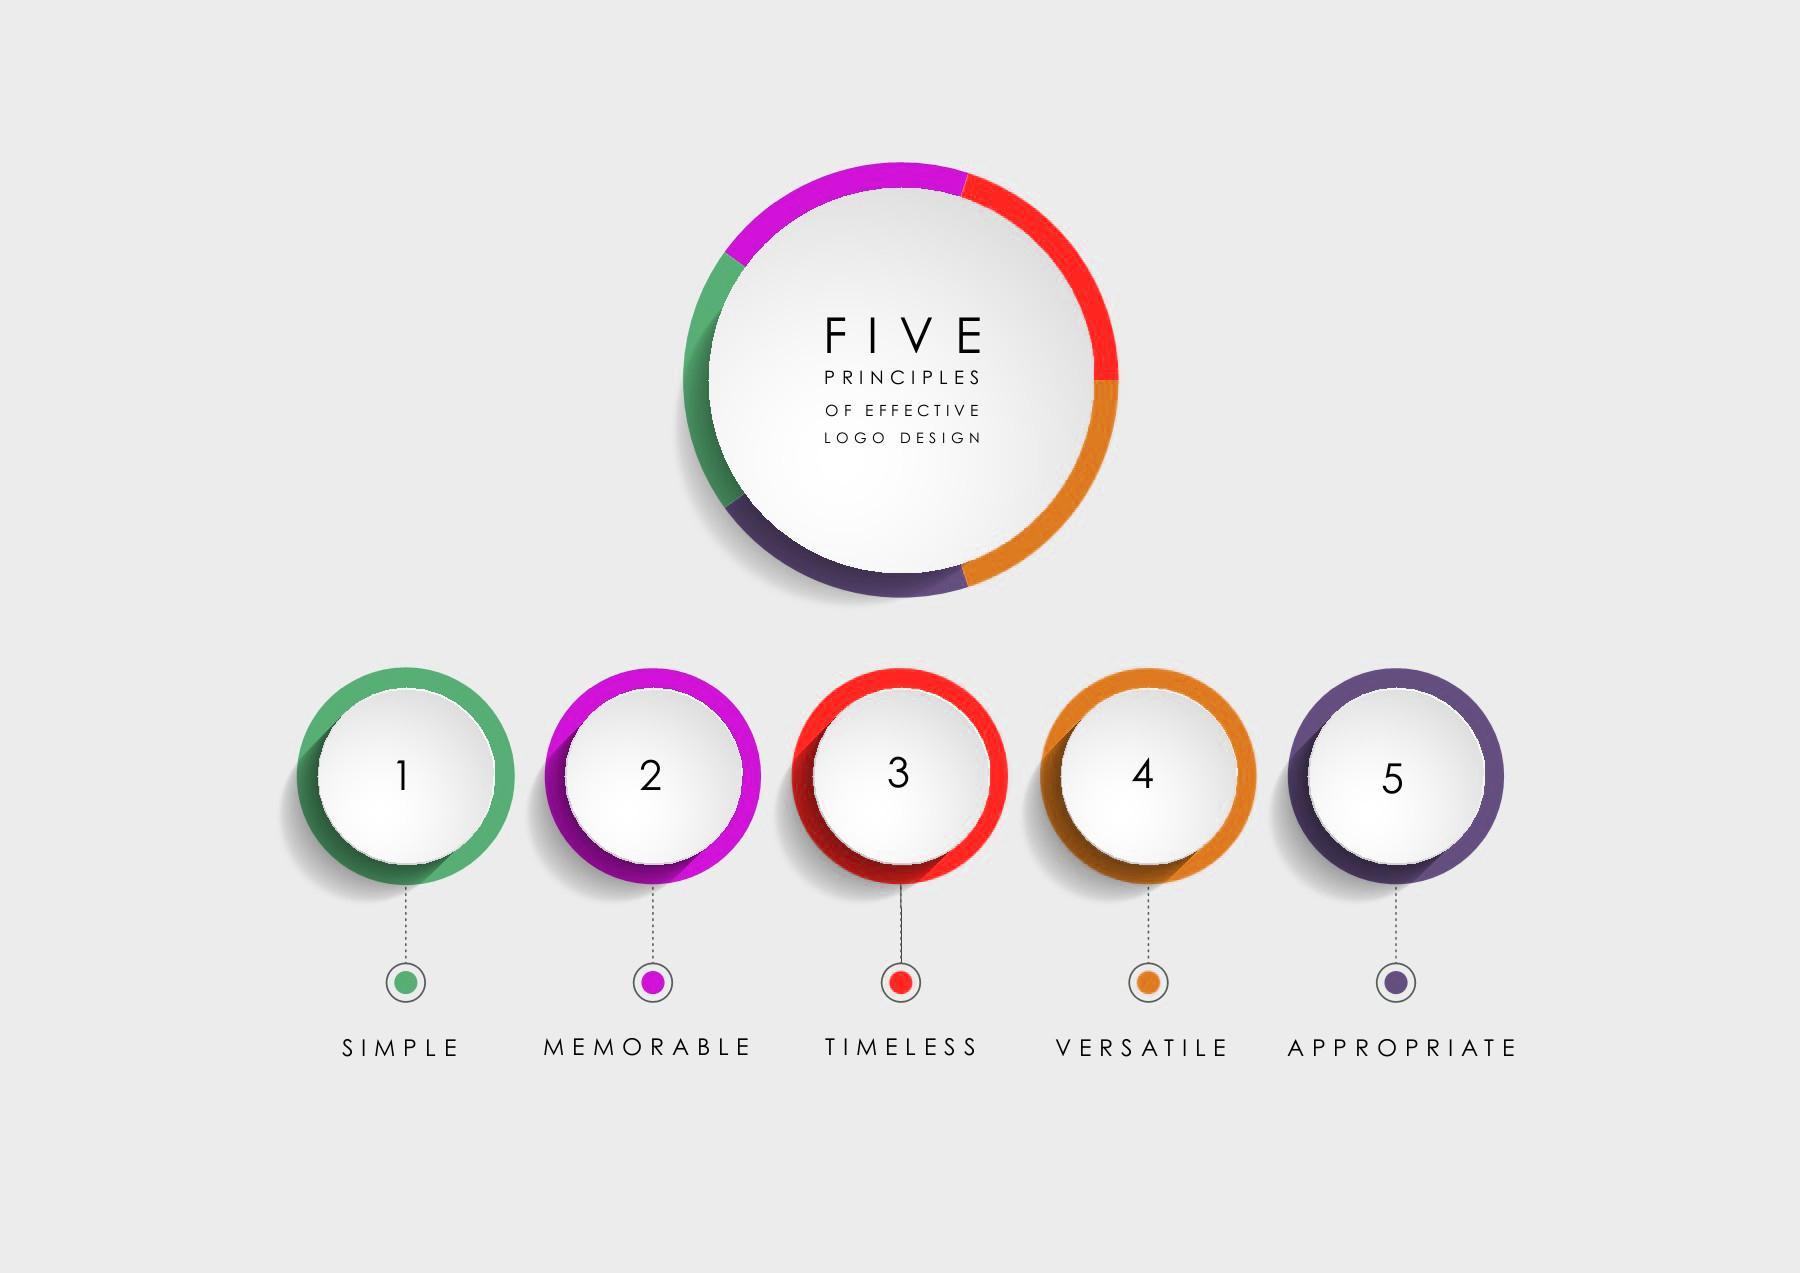 What Are The 5 Principles Of Effective Logo Design Verzex Digital Services Network,Repair Concrete Front Steps Design Ideas